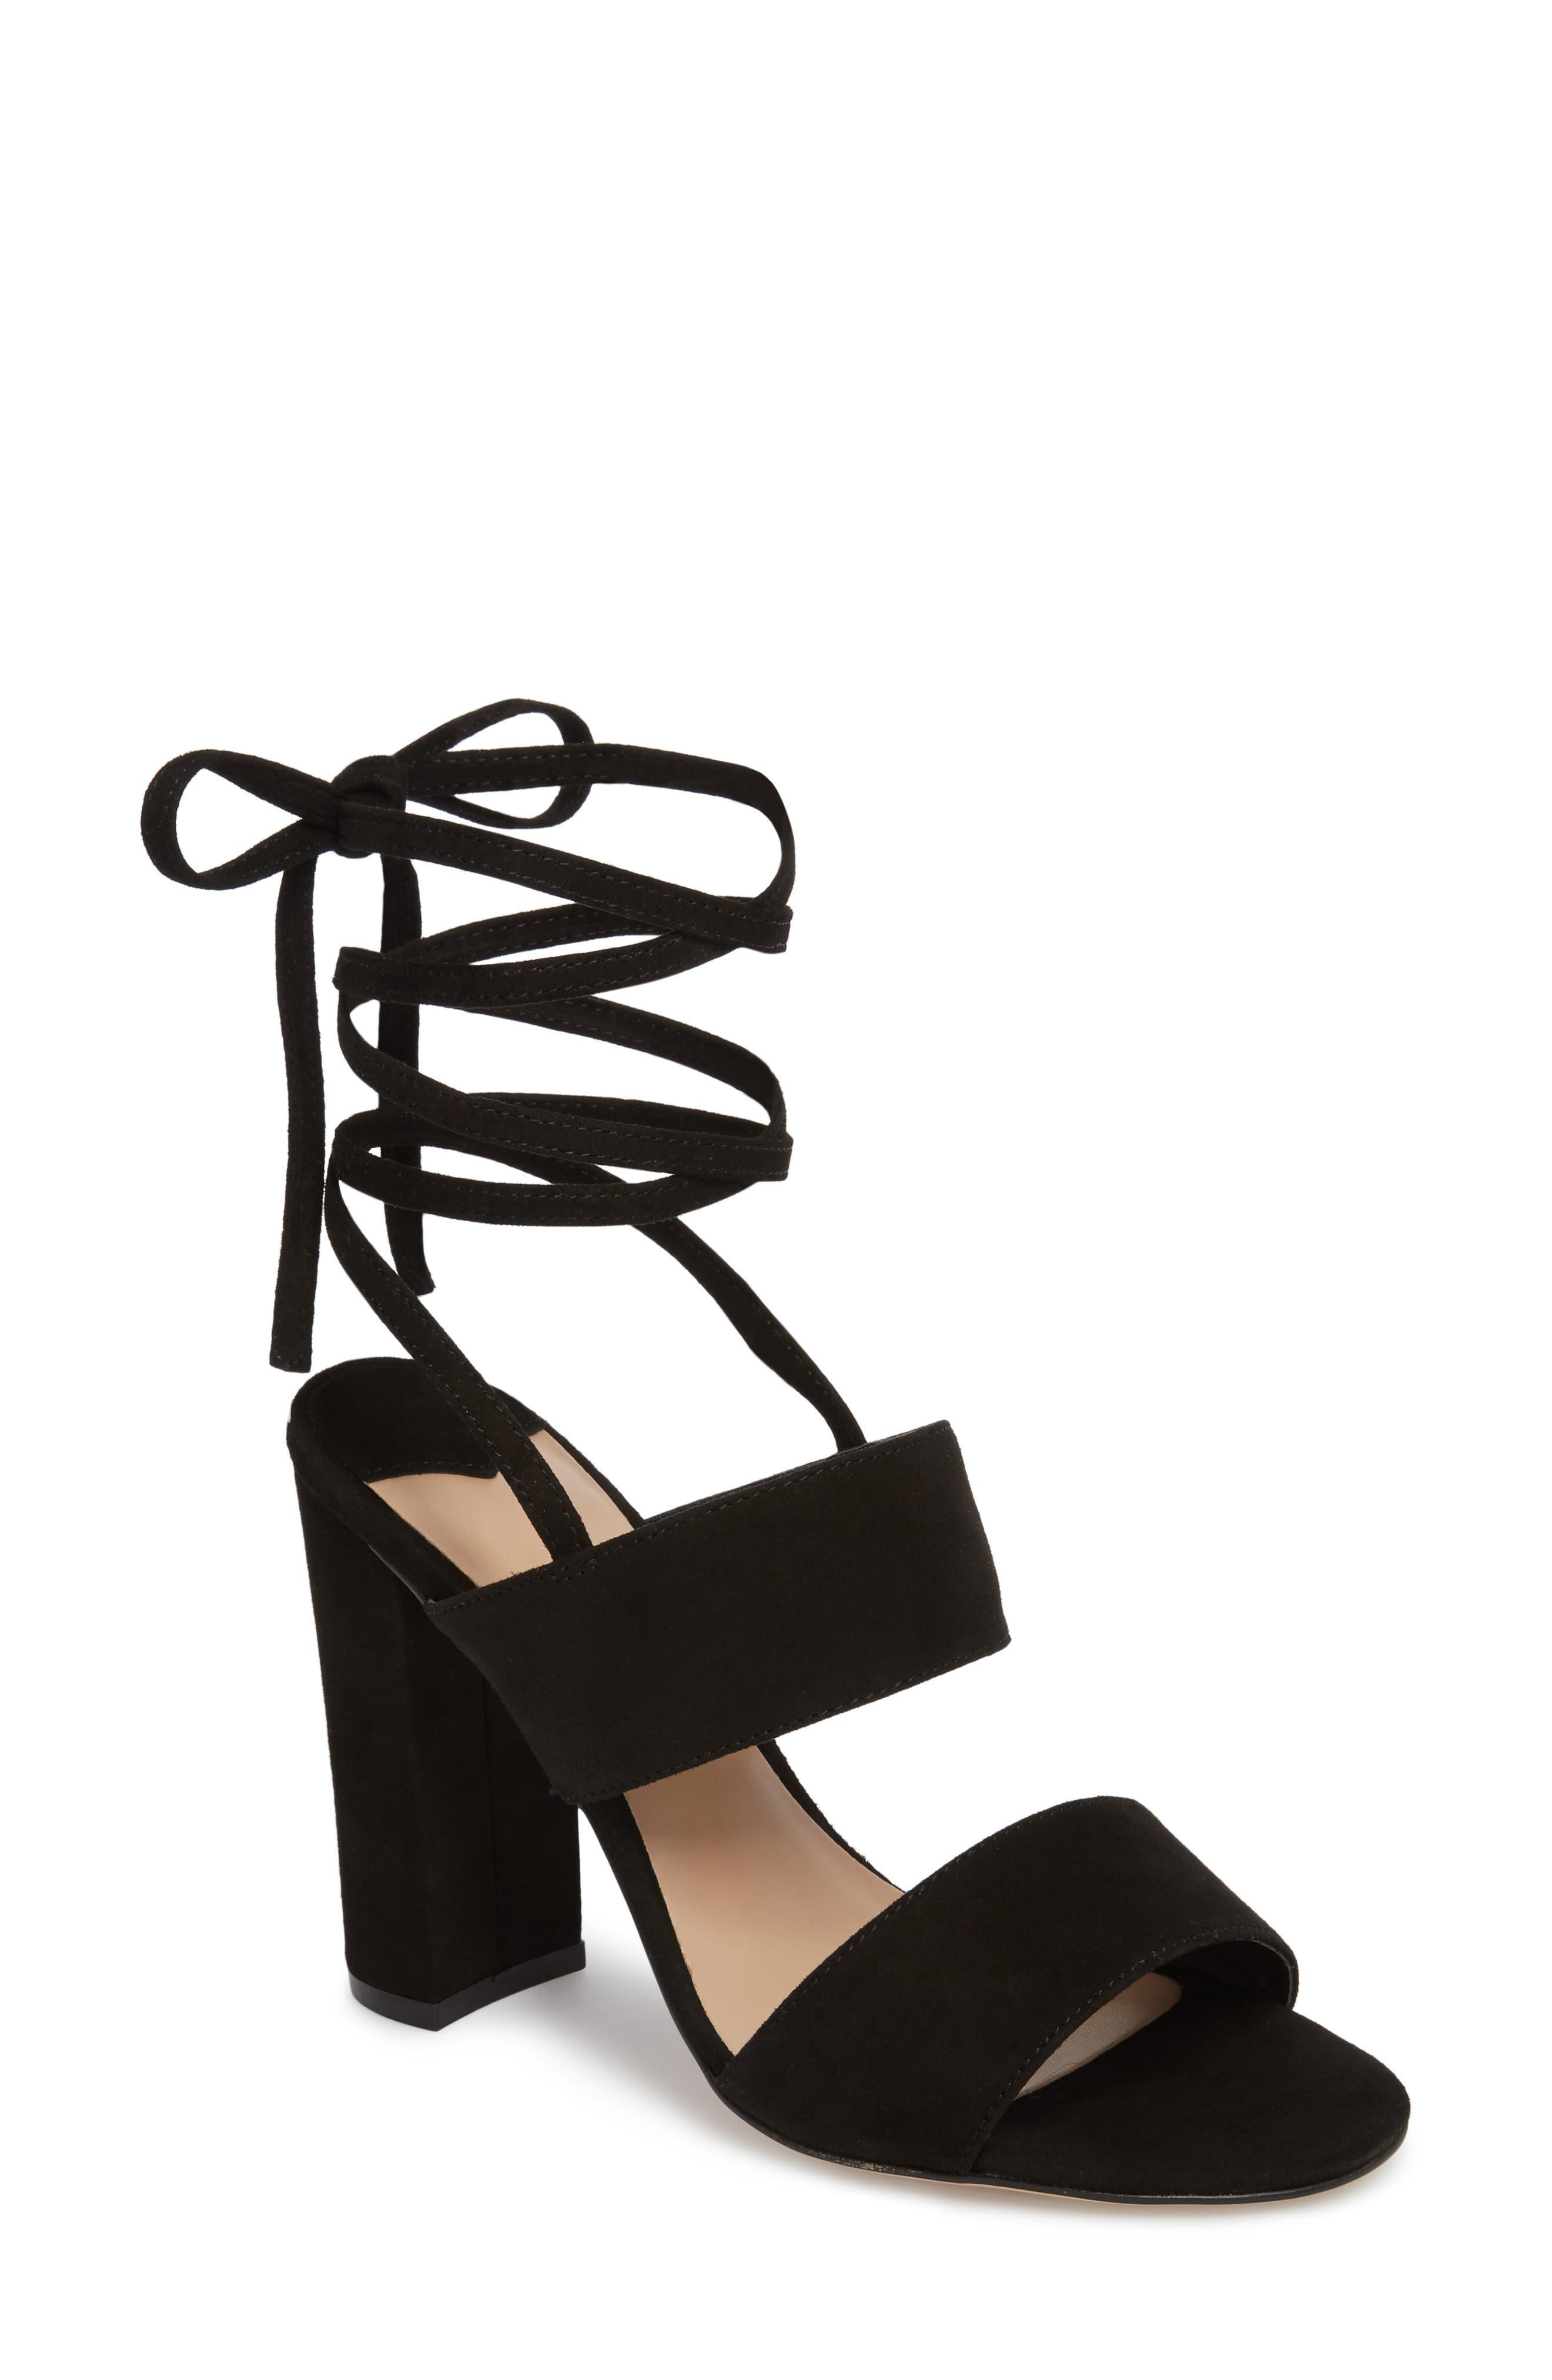 Kiko Ankle Tie Sandal,                         Main,                         color, Black Suede